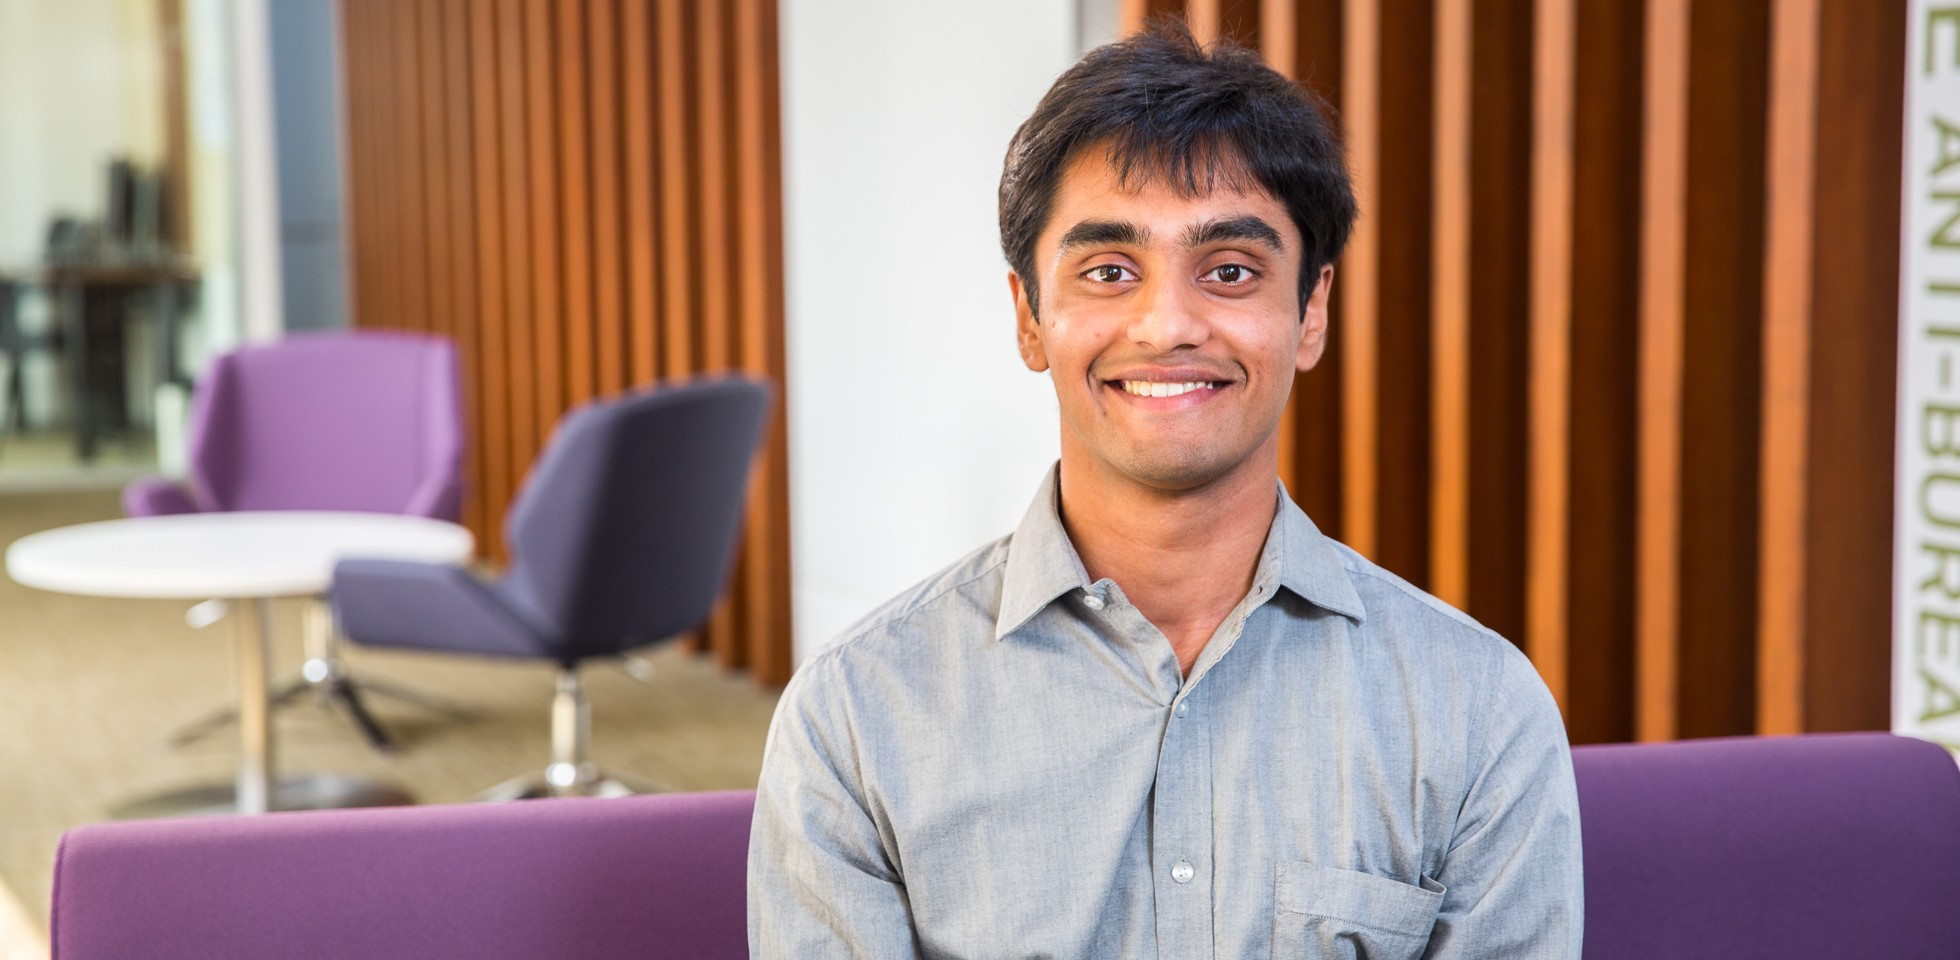 Pranav, Analyst, Business Operations & Enterprise Systems - BlackRock India Careers